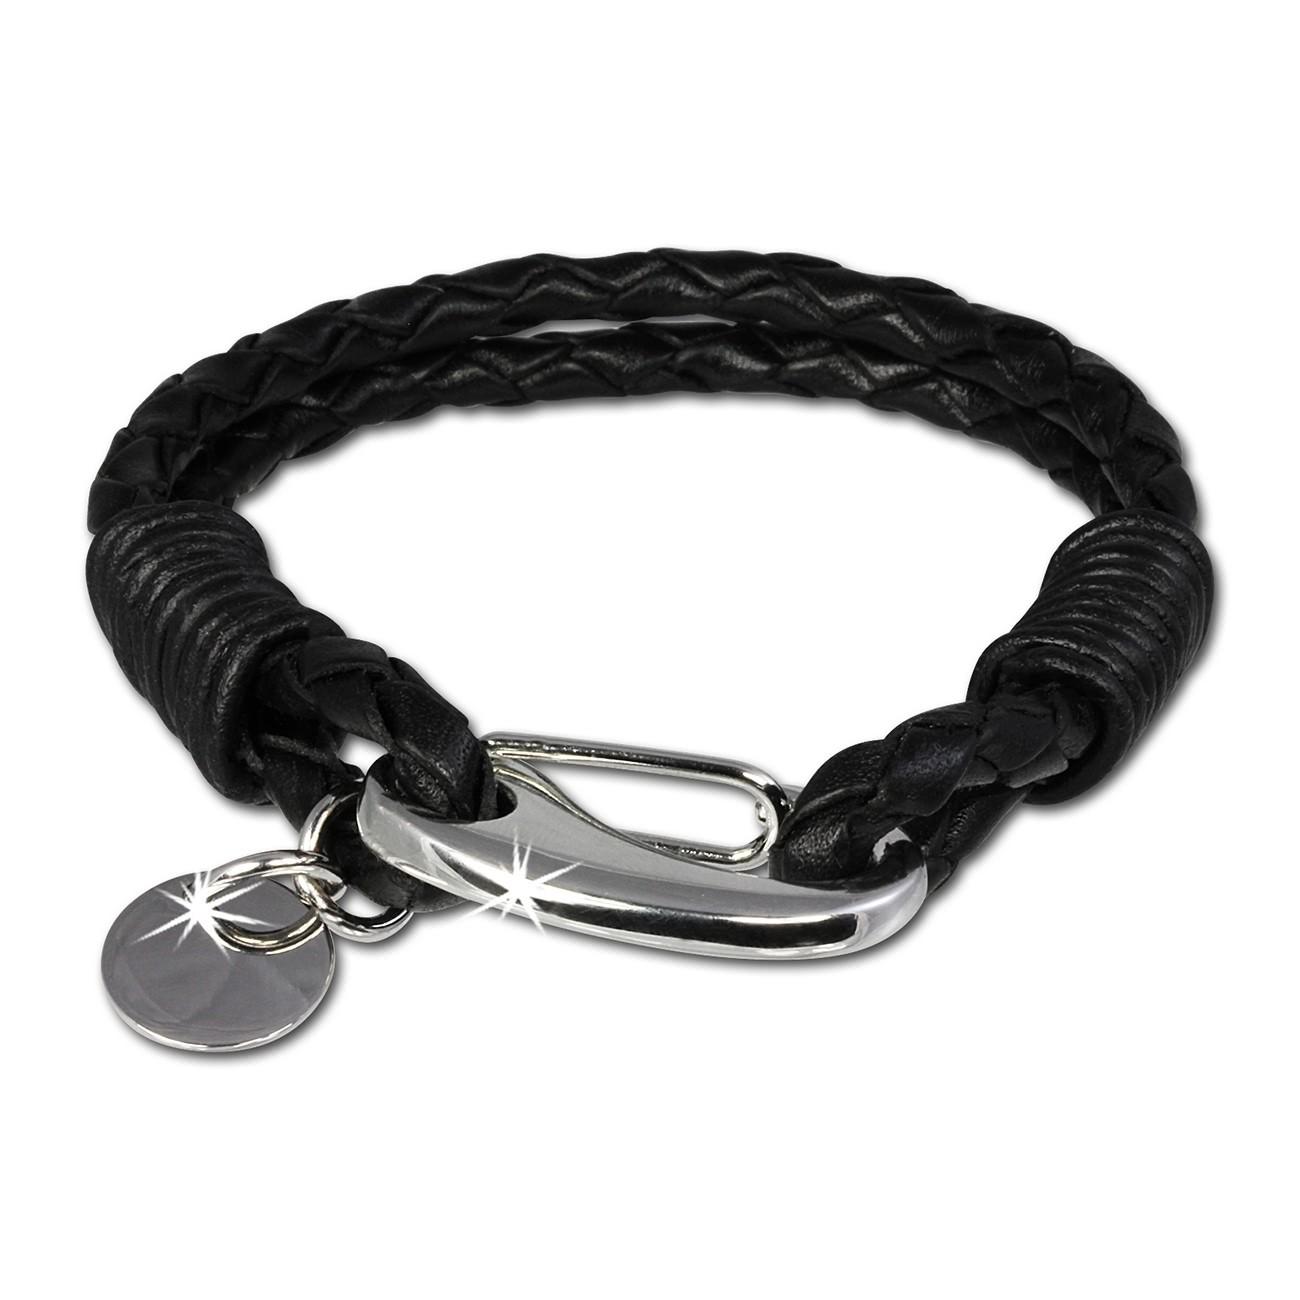 SilberDream Edelstahl Lederarmband schwarz Bolo-Armband LAP521S